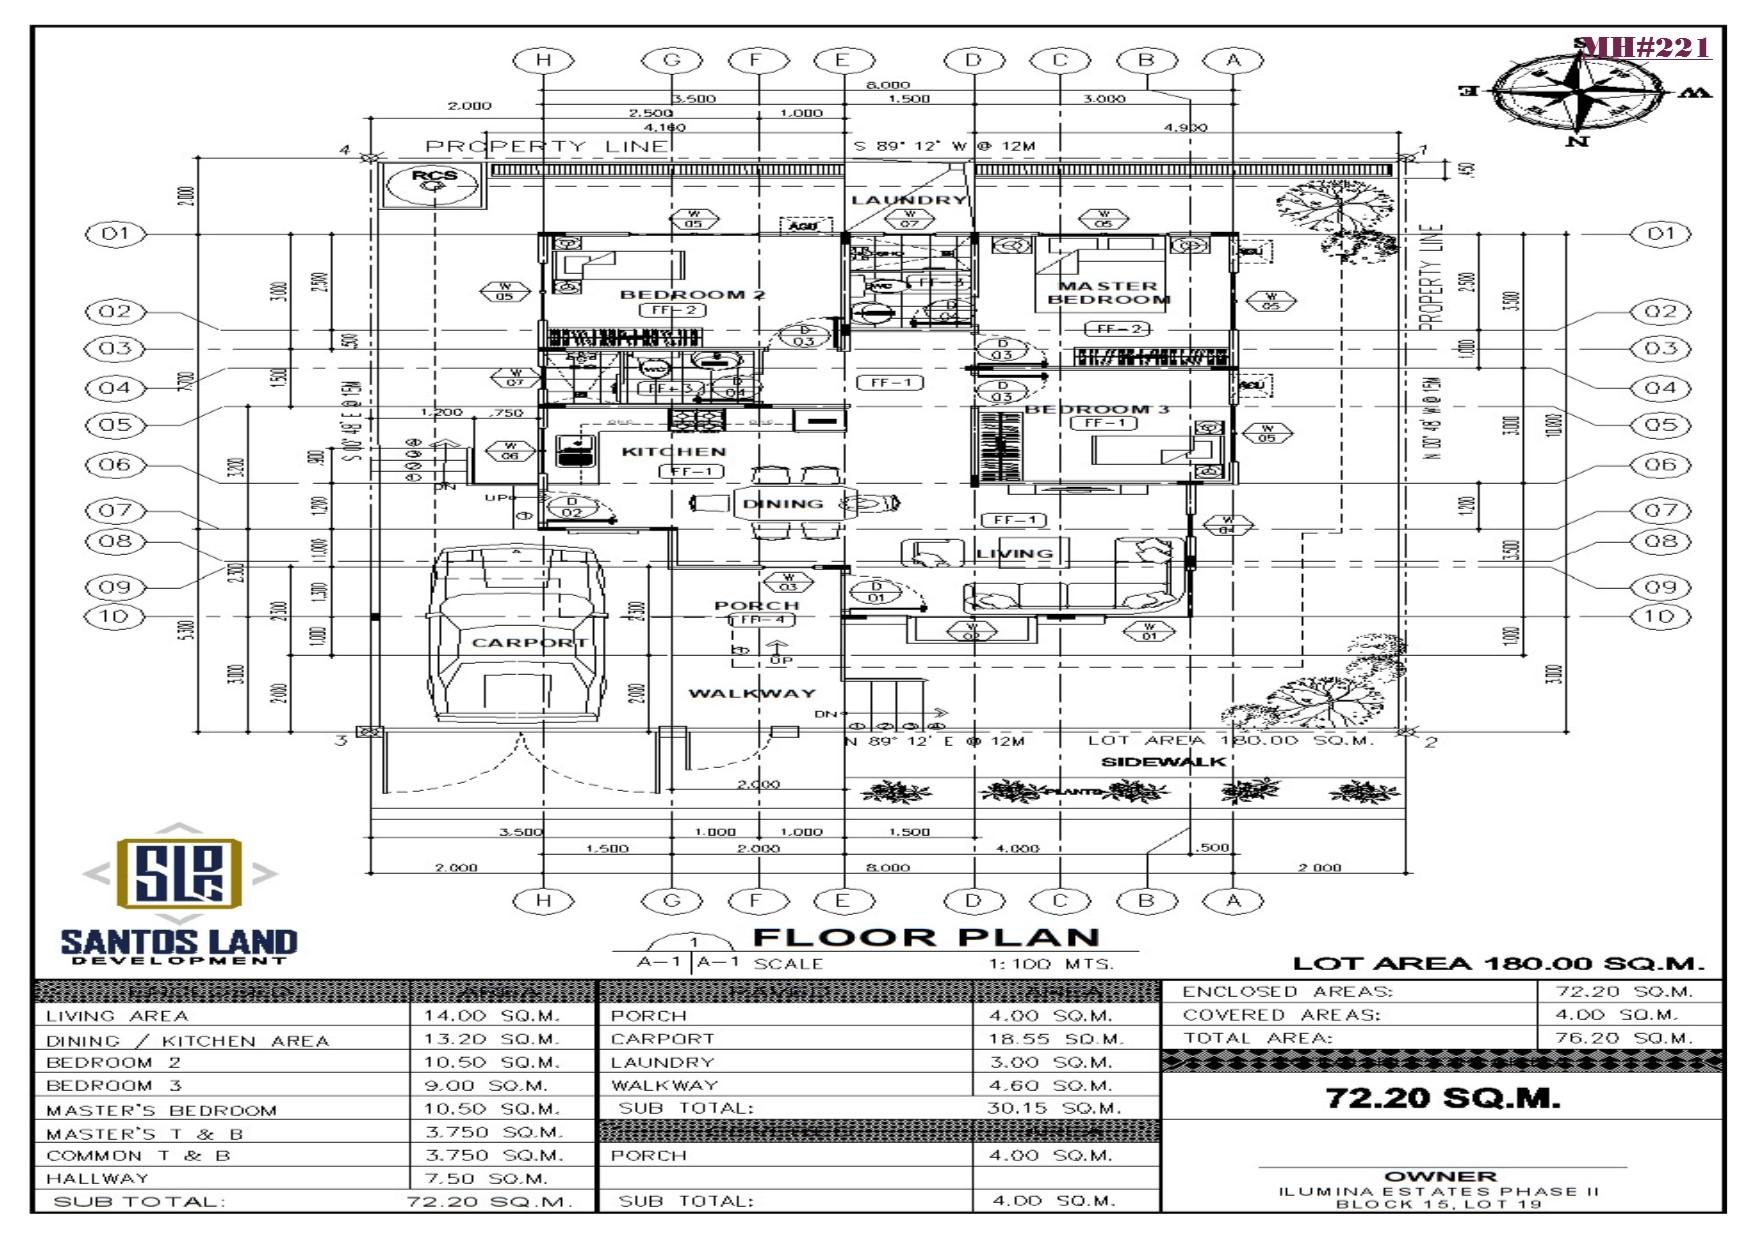 ilumina-estates-phase-2-bungalow-house-221-floor-plan